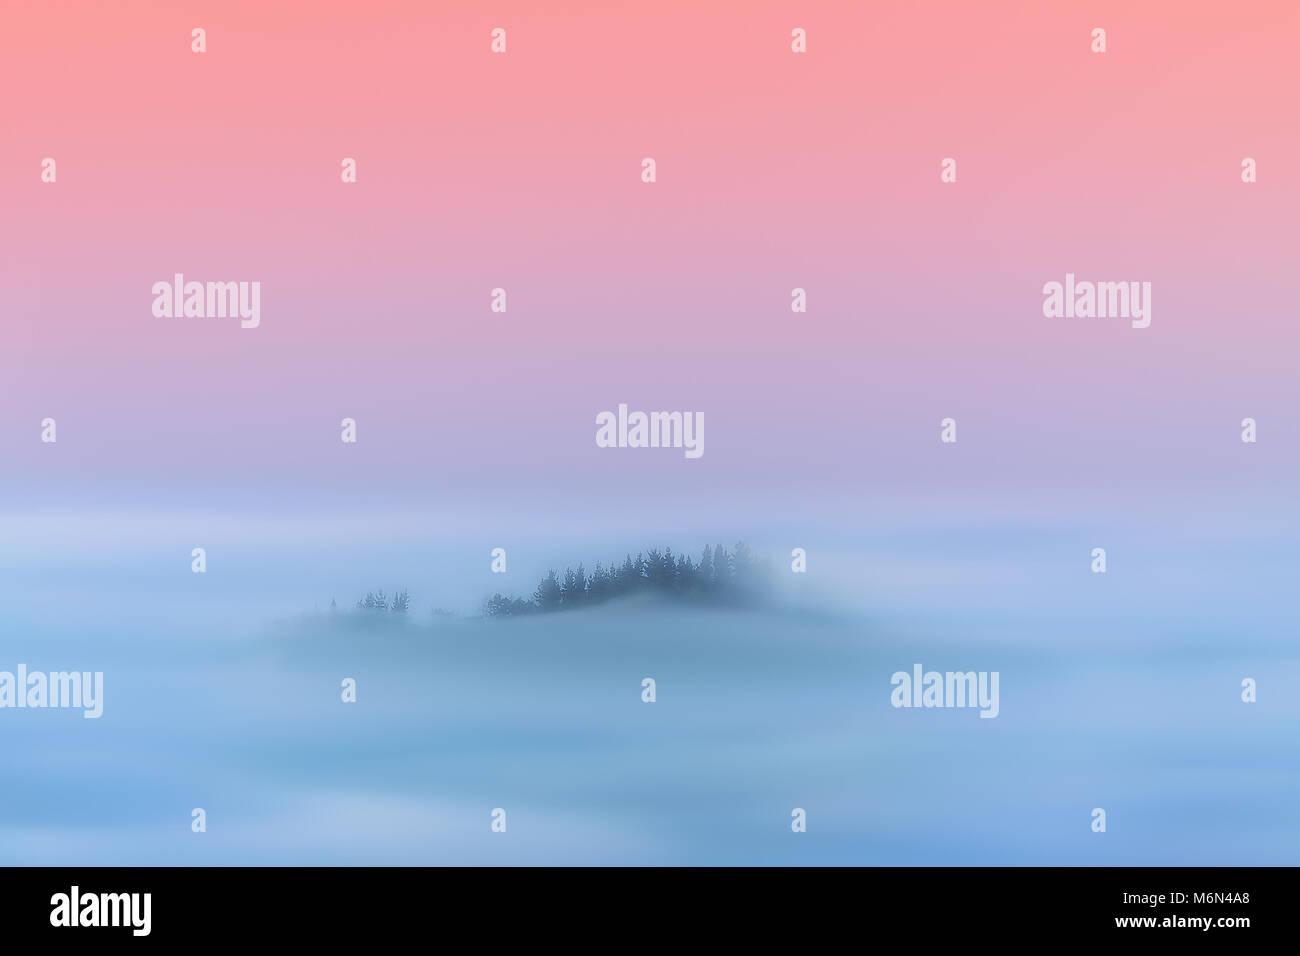 dreamy magic landscape of hazy forest - Stock Image